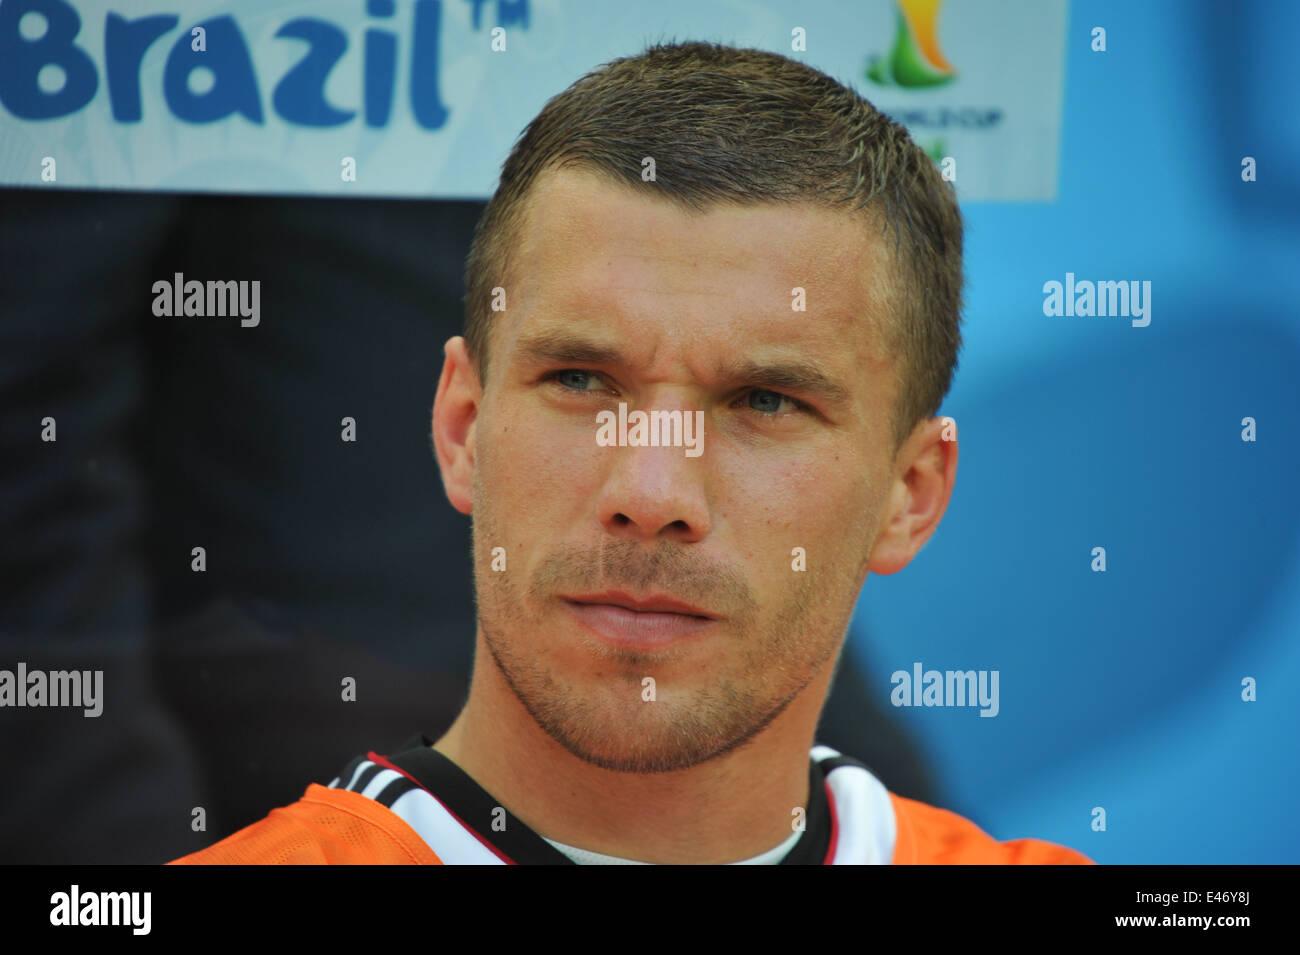 WM 2014, Salvador da Bahia, Lukas Podolski auf der Bank, Deutschland vs. Portugal. Editorial use only. Stock Photo